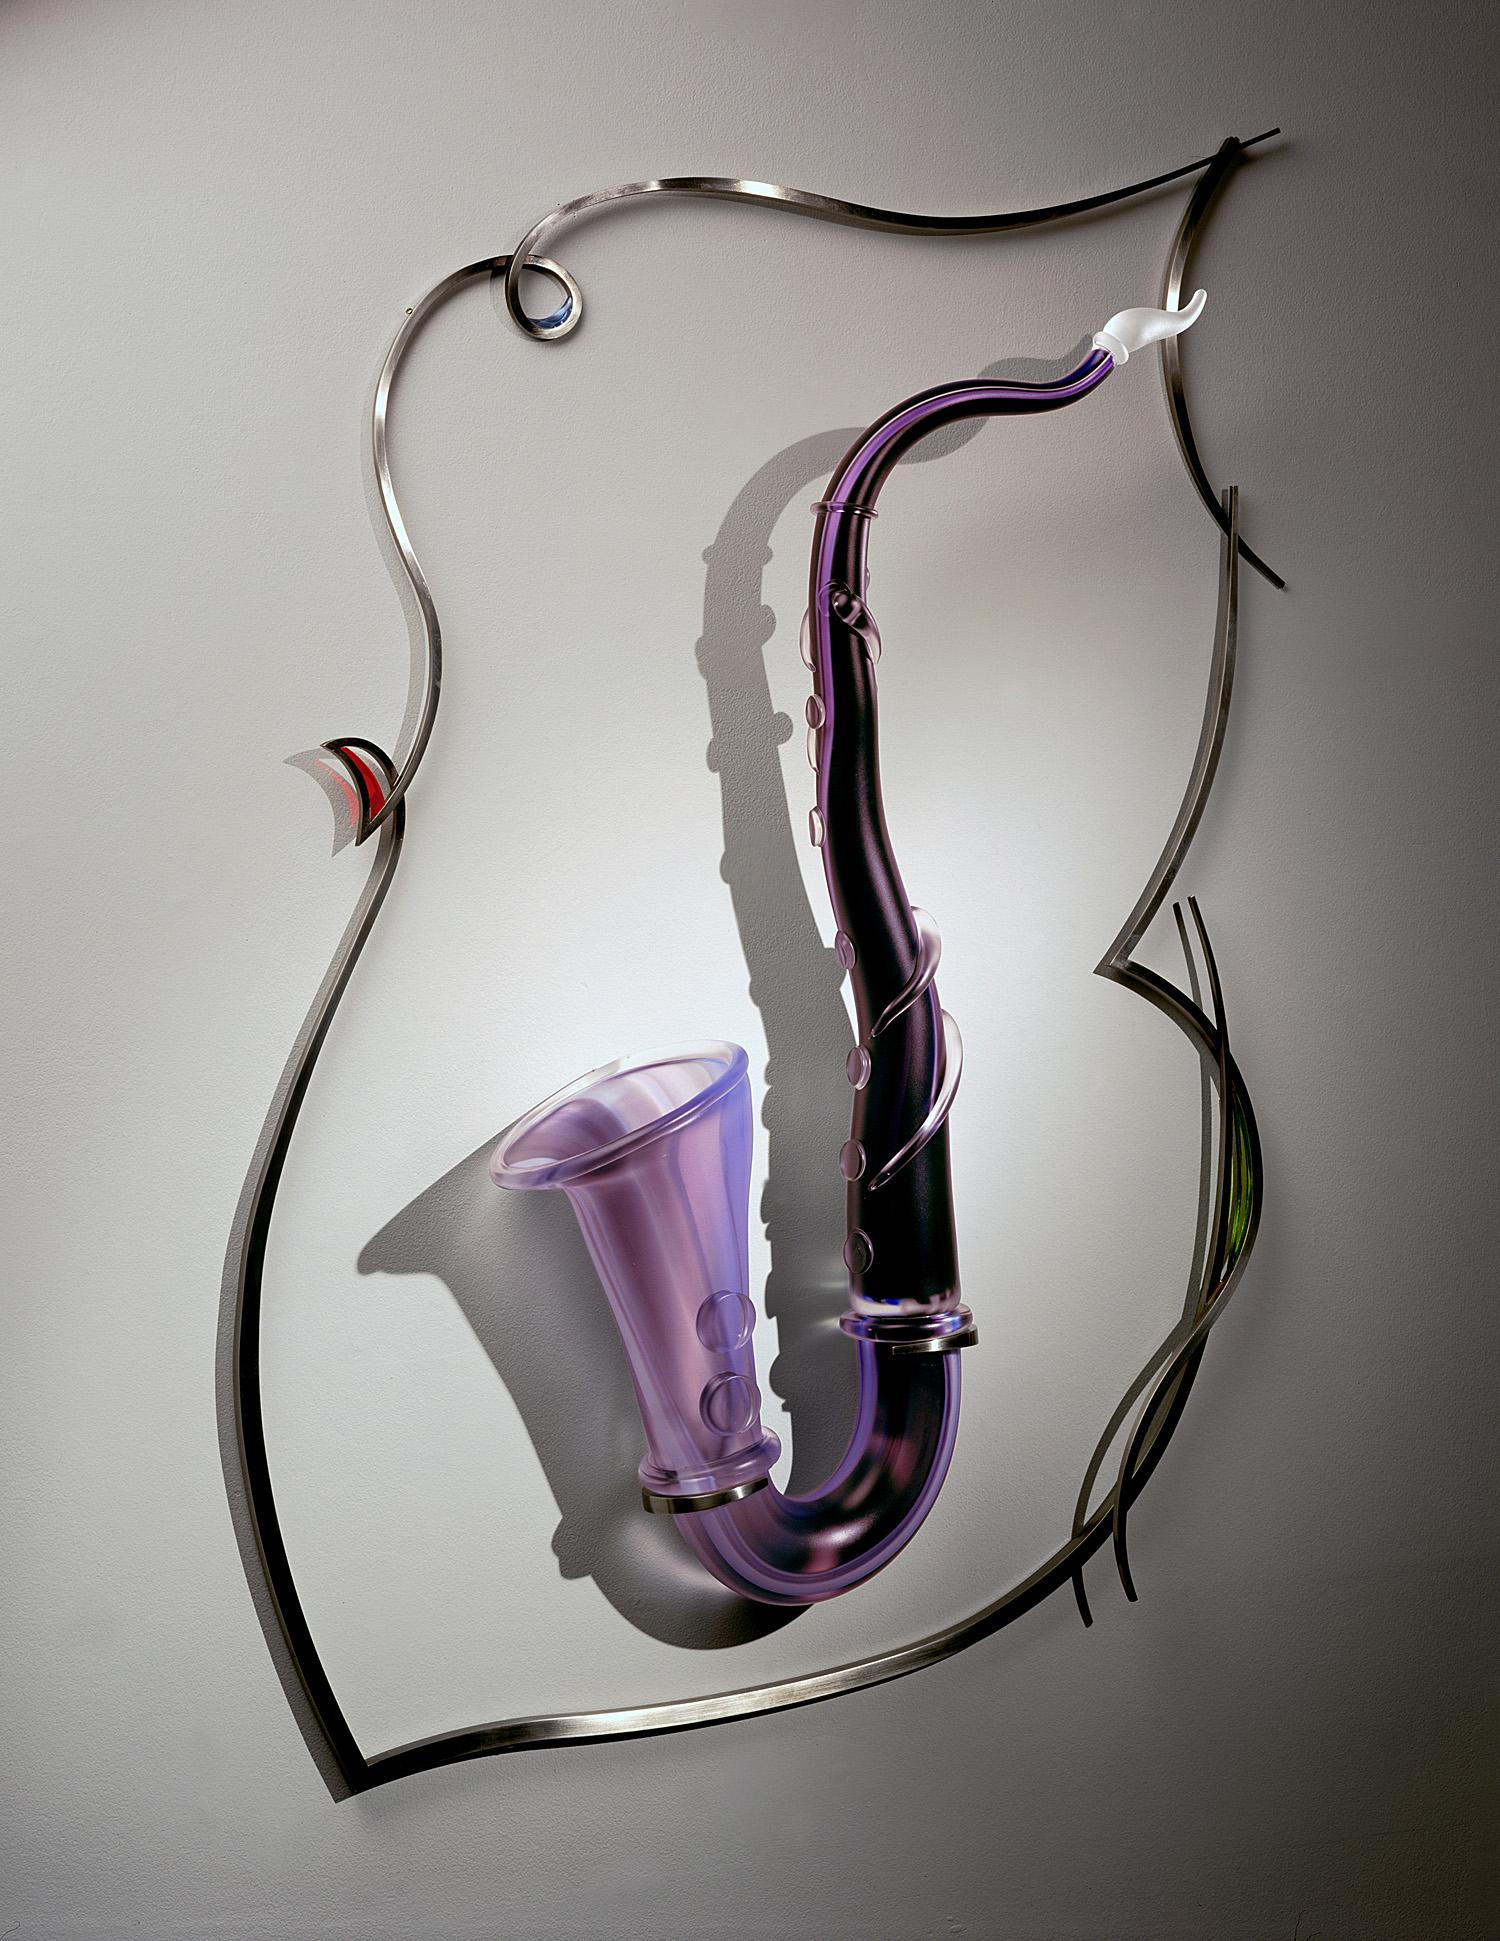 "Wistful   2003. Blown glass, glass details, nickel-plated bronze. 42 x 26 x 6"""